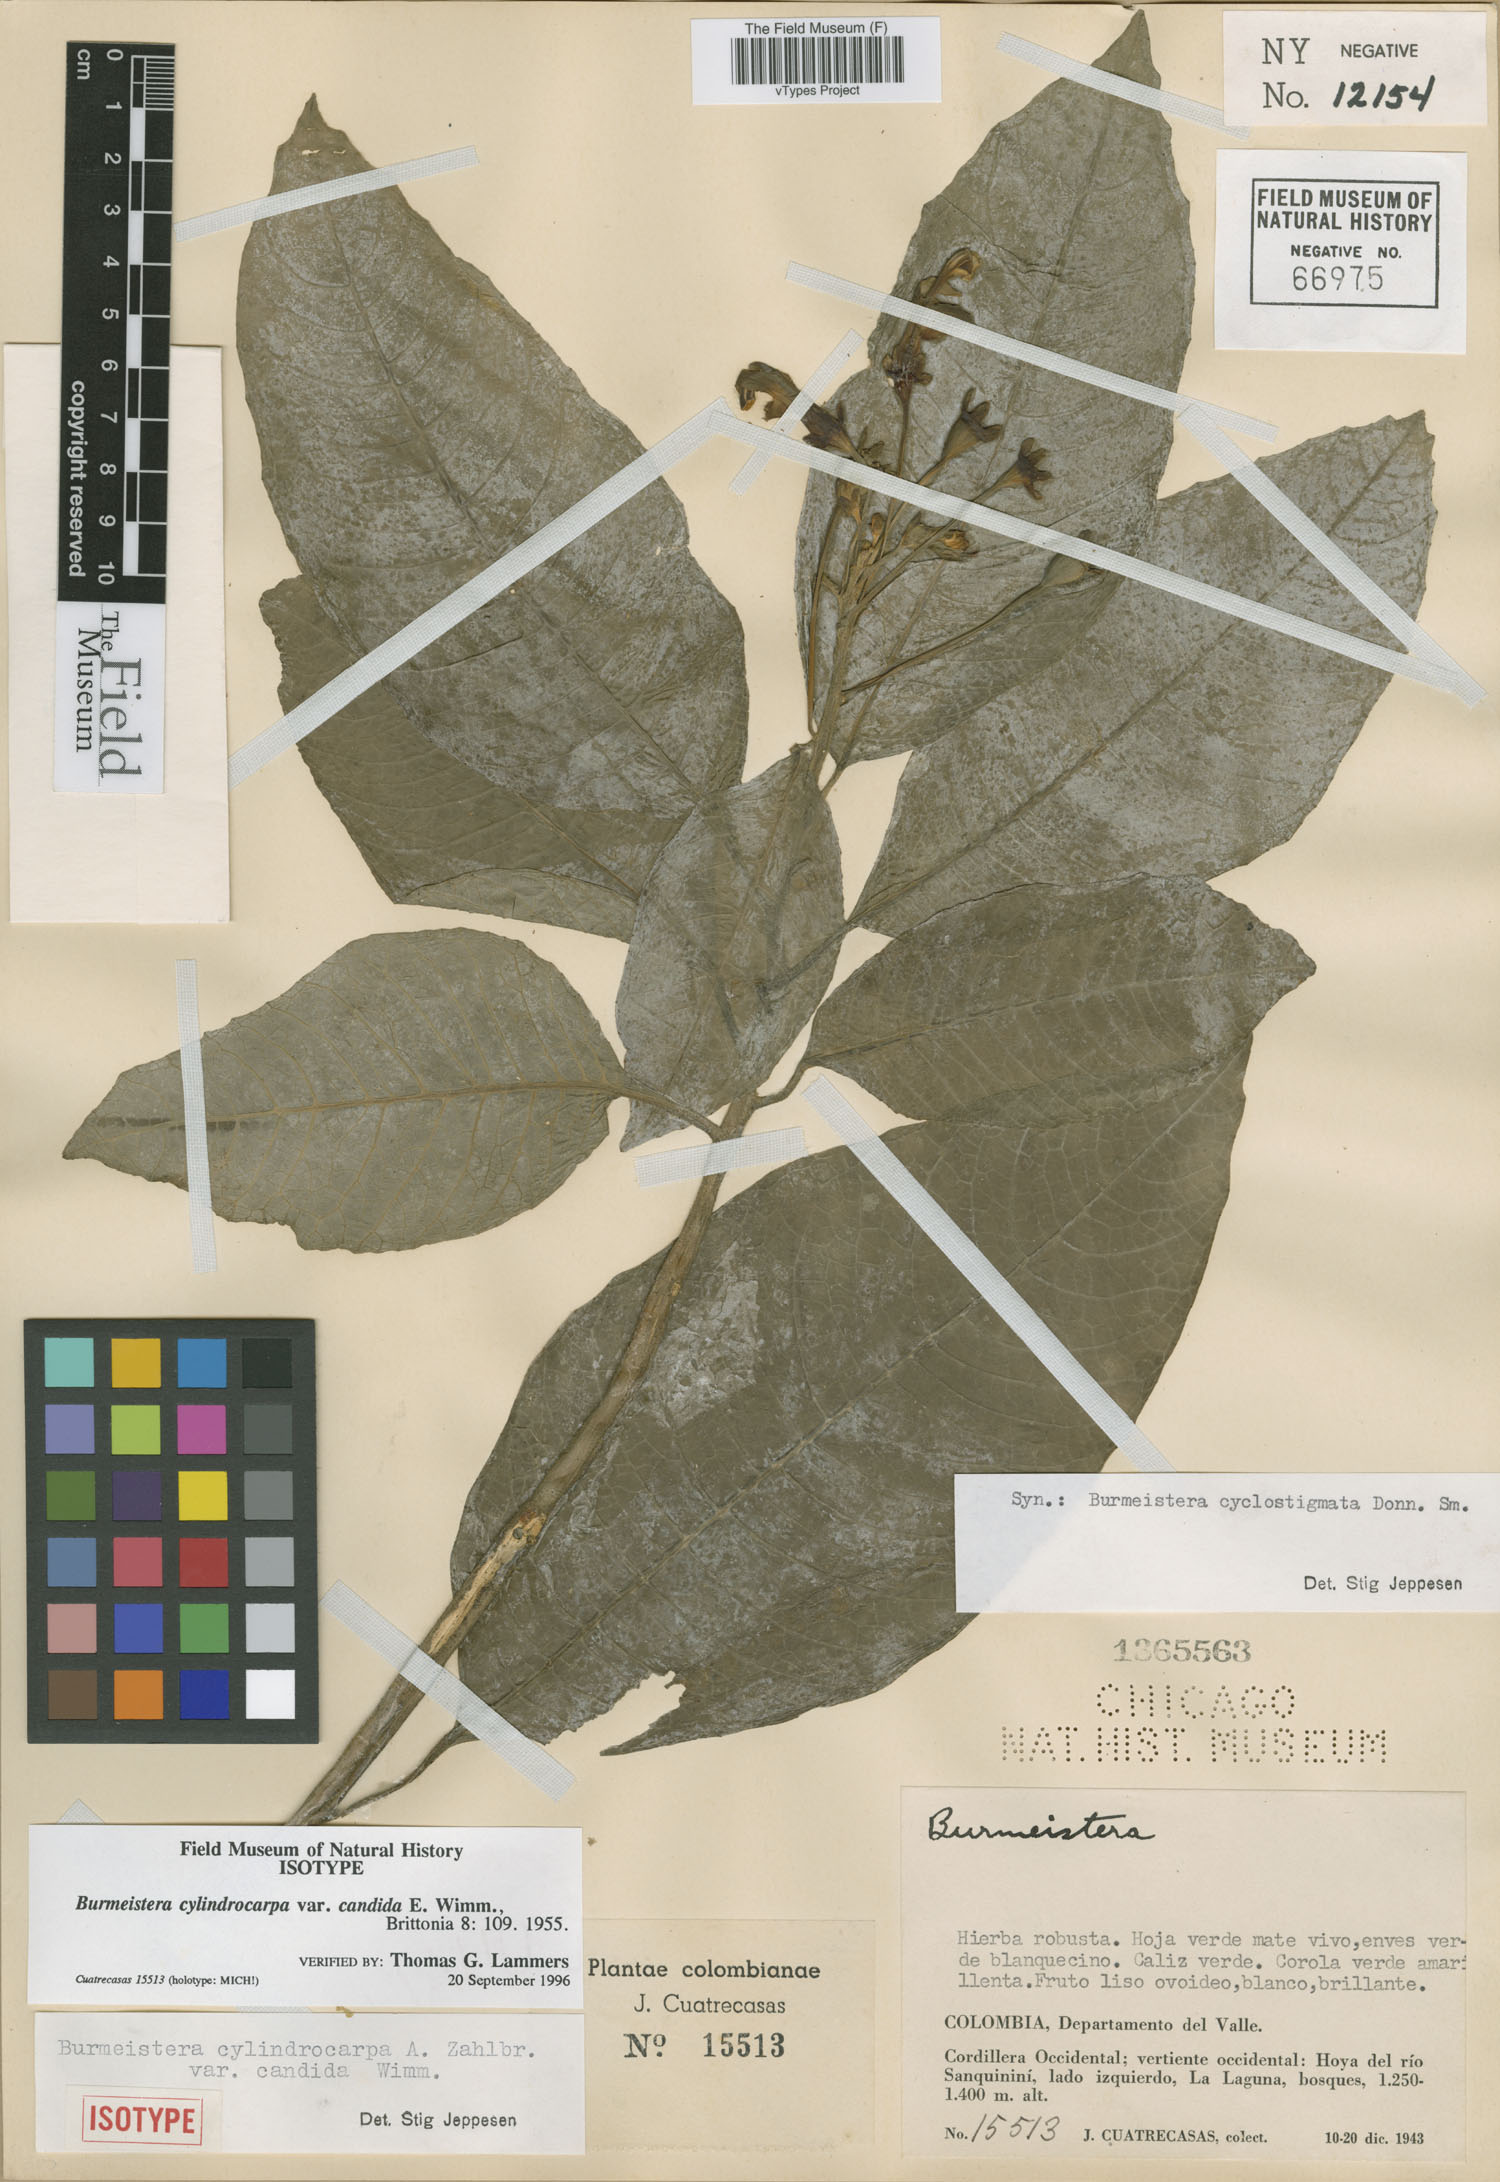 Burmeistera cylindrocarpa image